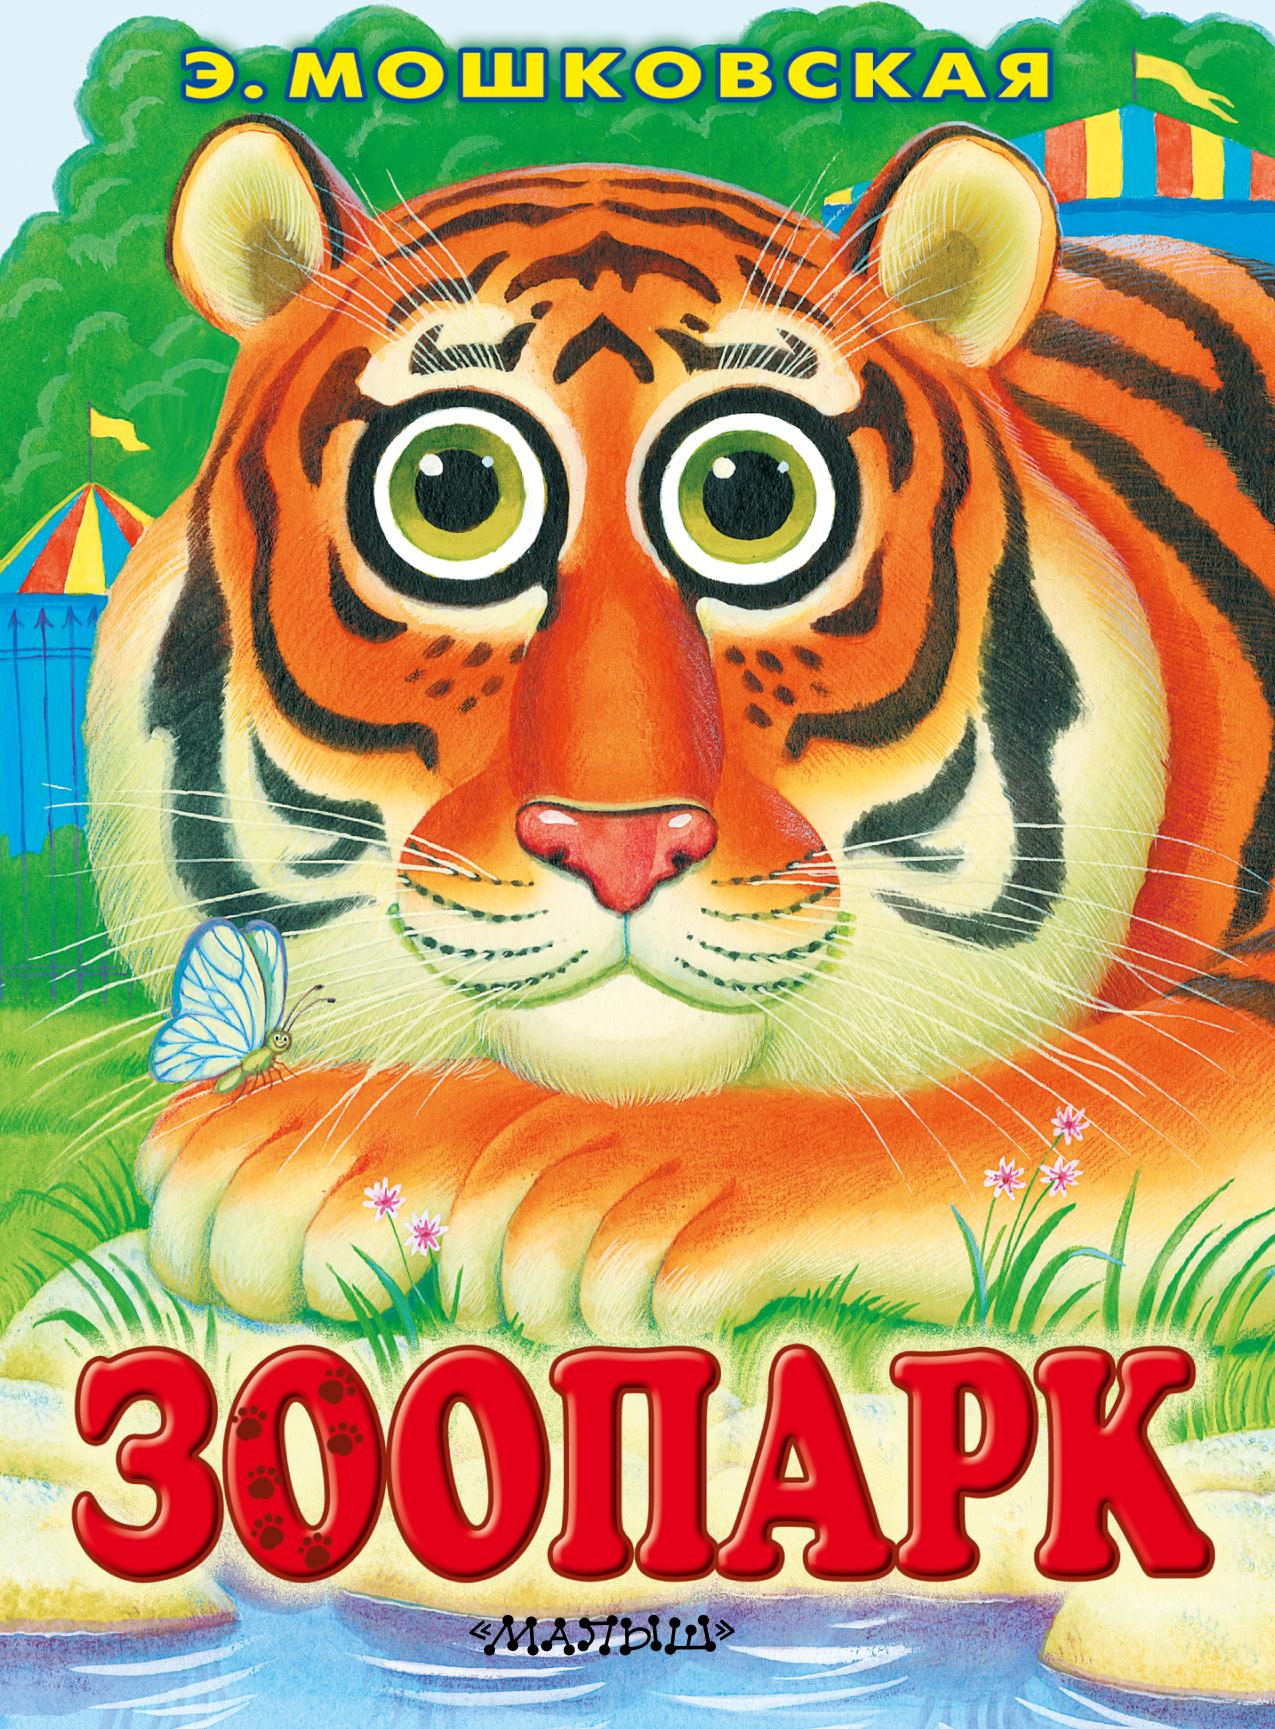 Зоопарк, Мошковская Эмма Эфраимовна